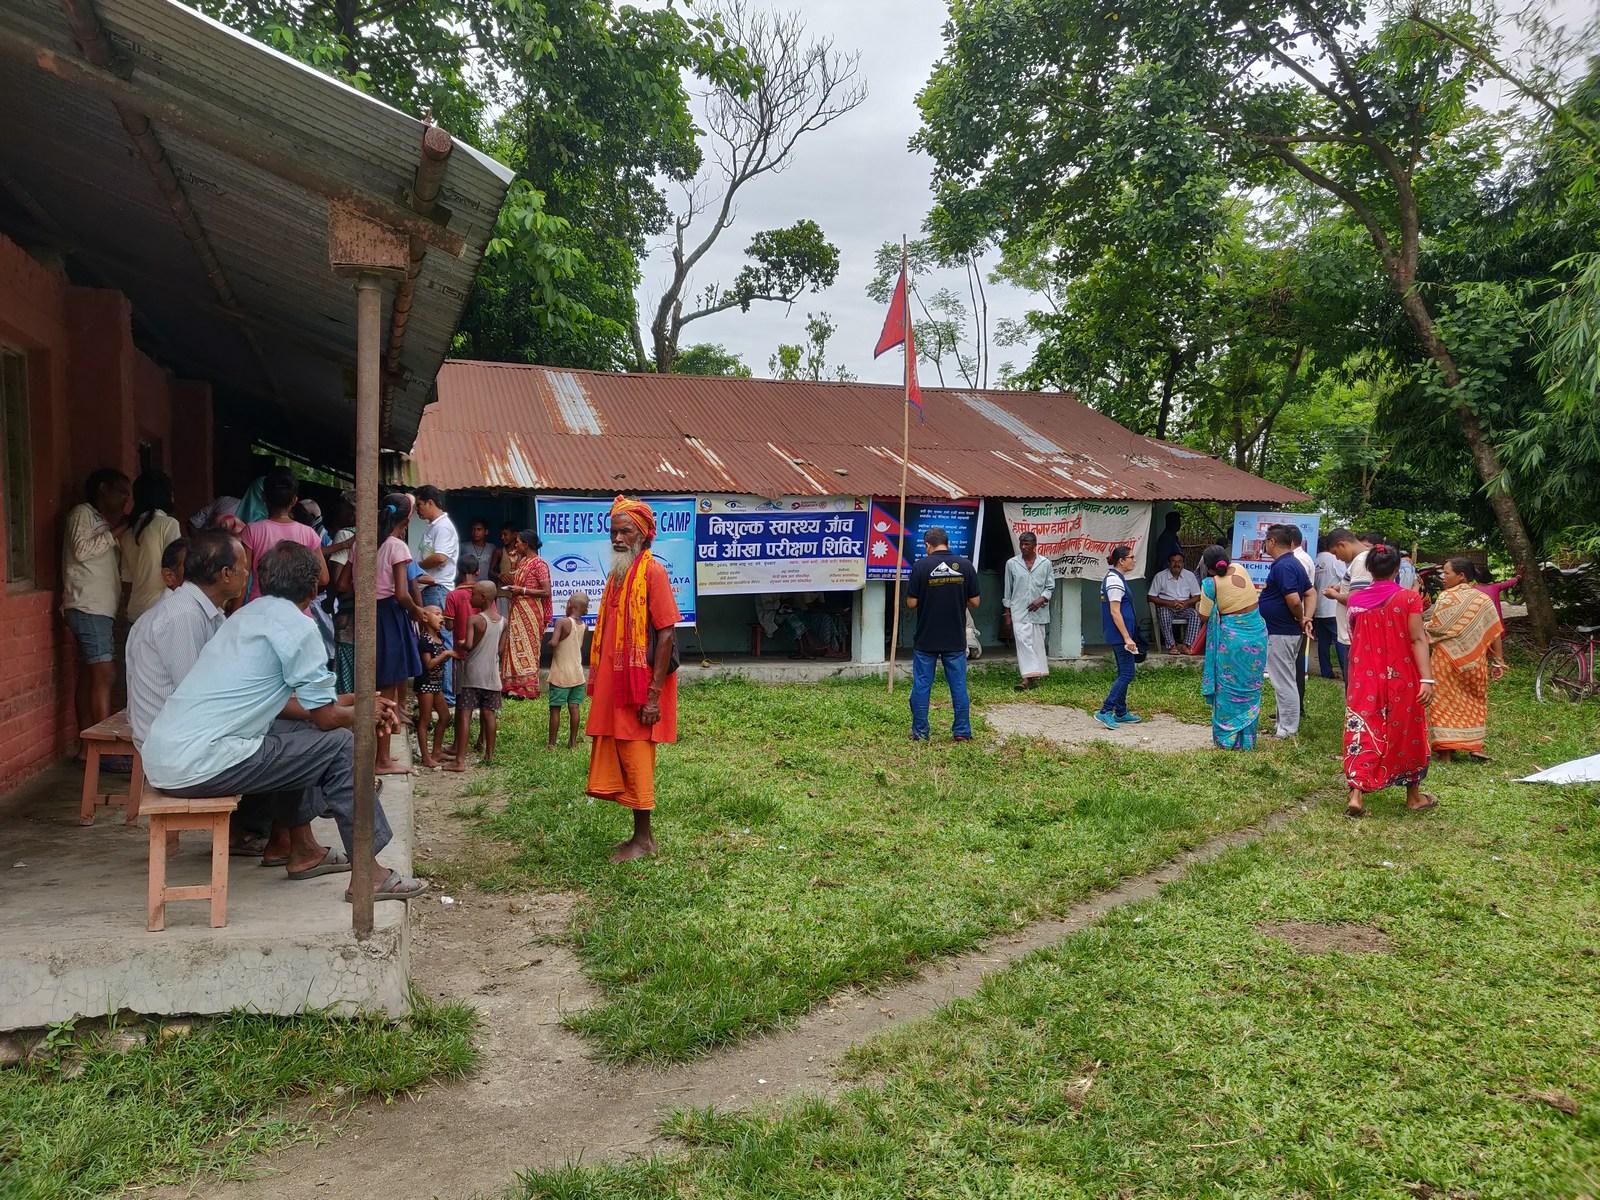 Free-Health-Camp-Eye-Screening-at-Gwala-Basti-Mechinagar-15-Jhapa-Nepal-Rotary-Club-of-Kakarvitta-18